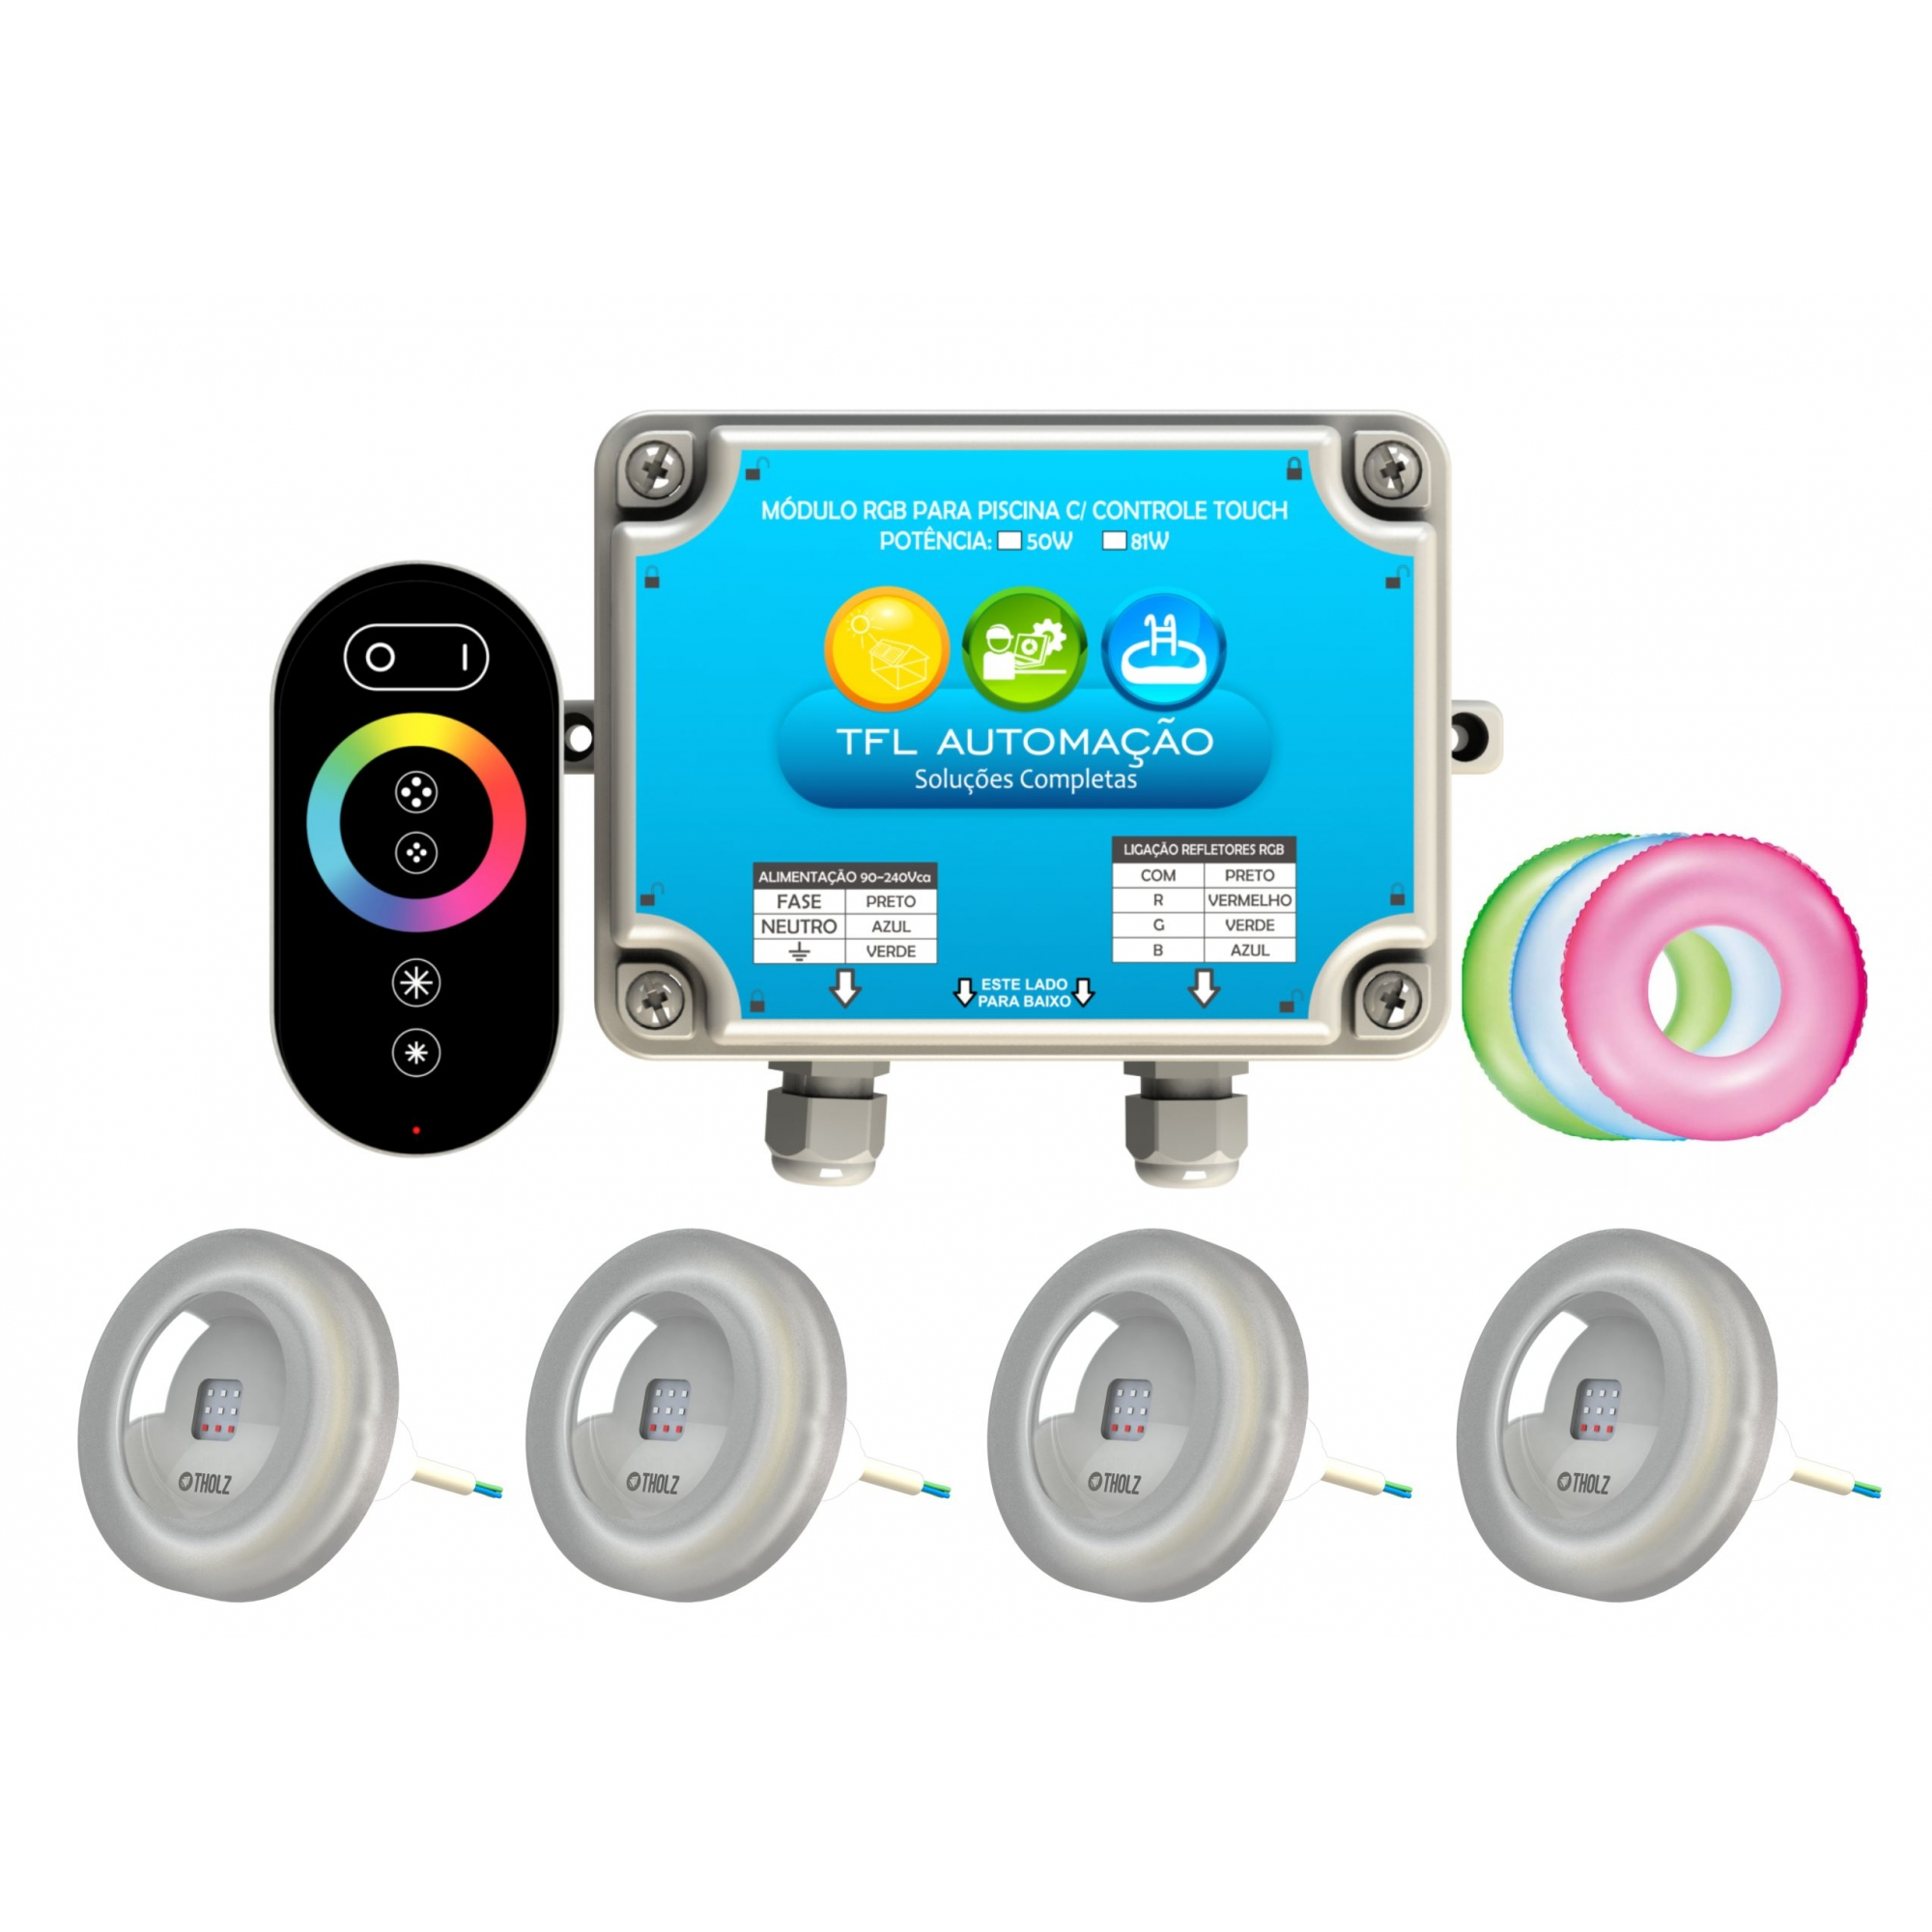 Kit Iluminação Piscina - 4 Leds Rgb 4,5w Tholz + Módulo c/ Controle Touch 50w